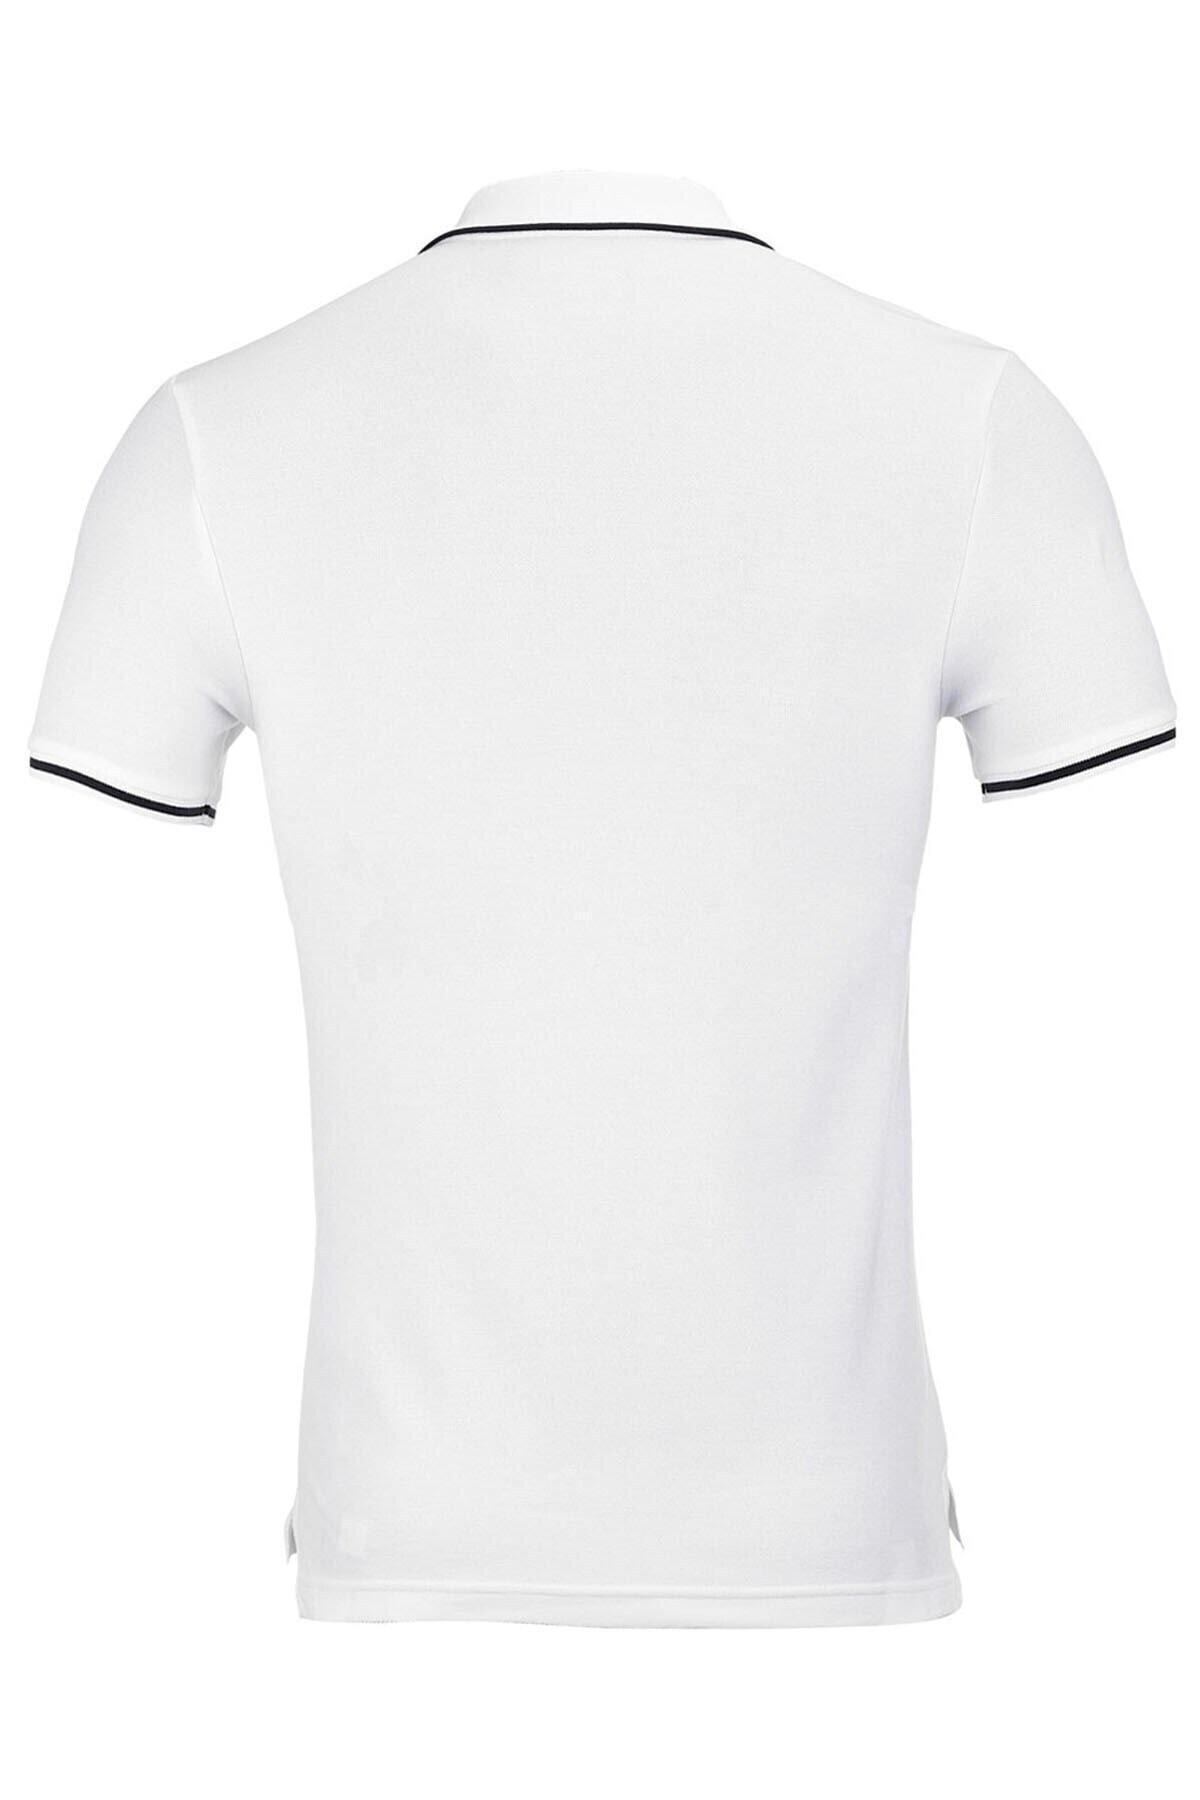 Nike Erkek Beyaz M Polo Tm Club19 Polo Tişört Aj1502-100 2